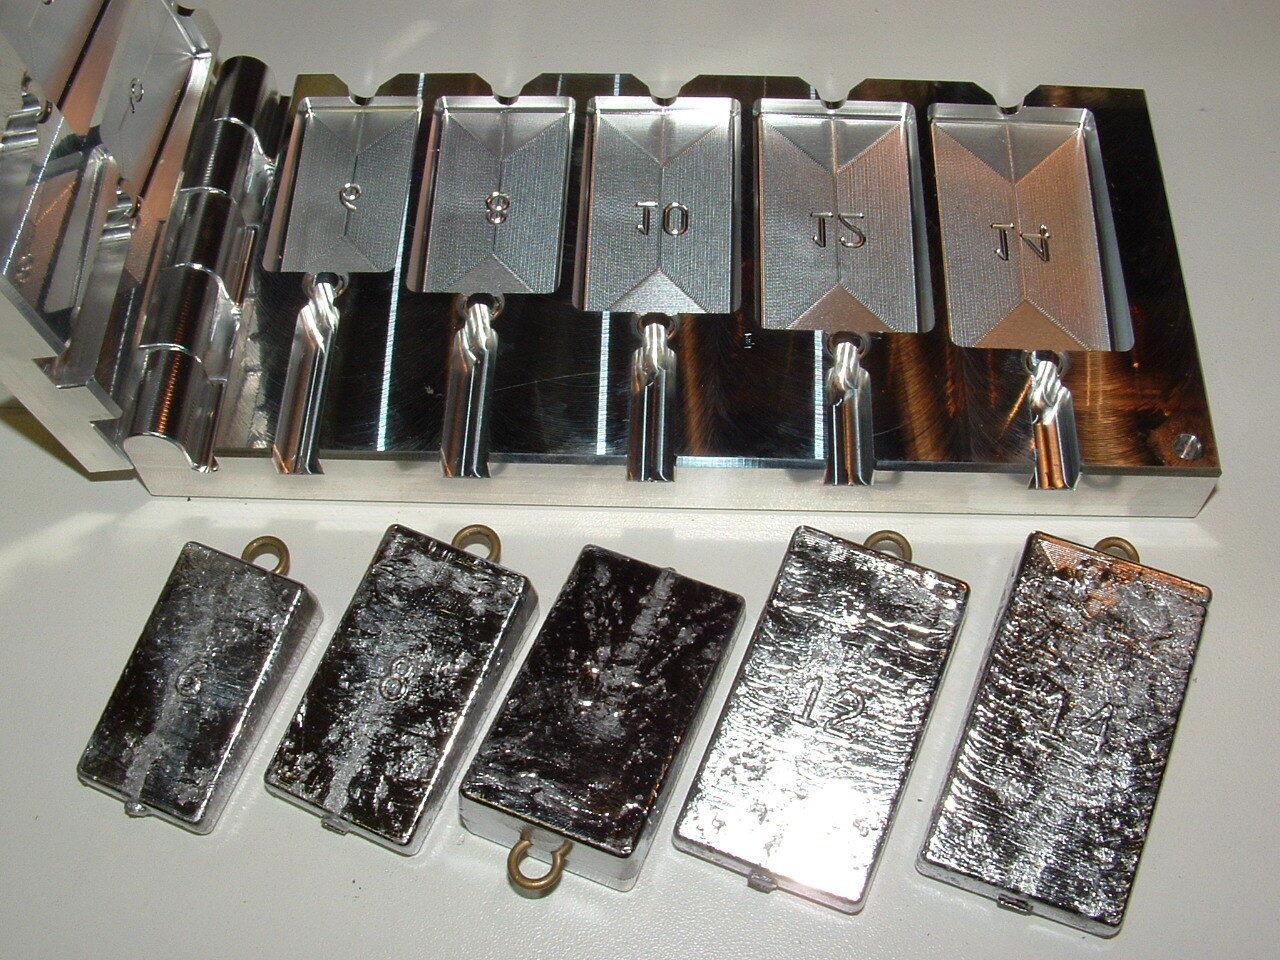 Saltwater Wedge Sinker mold 6,8,10,12,14 oz CNC Aluminum Freshwater Salmon